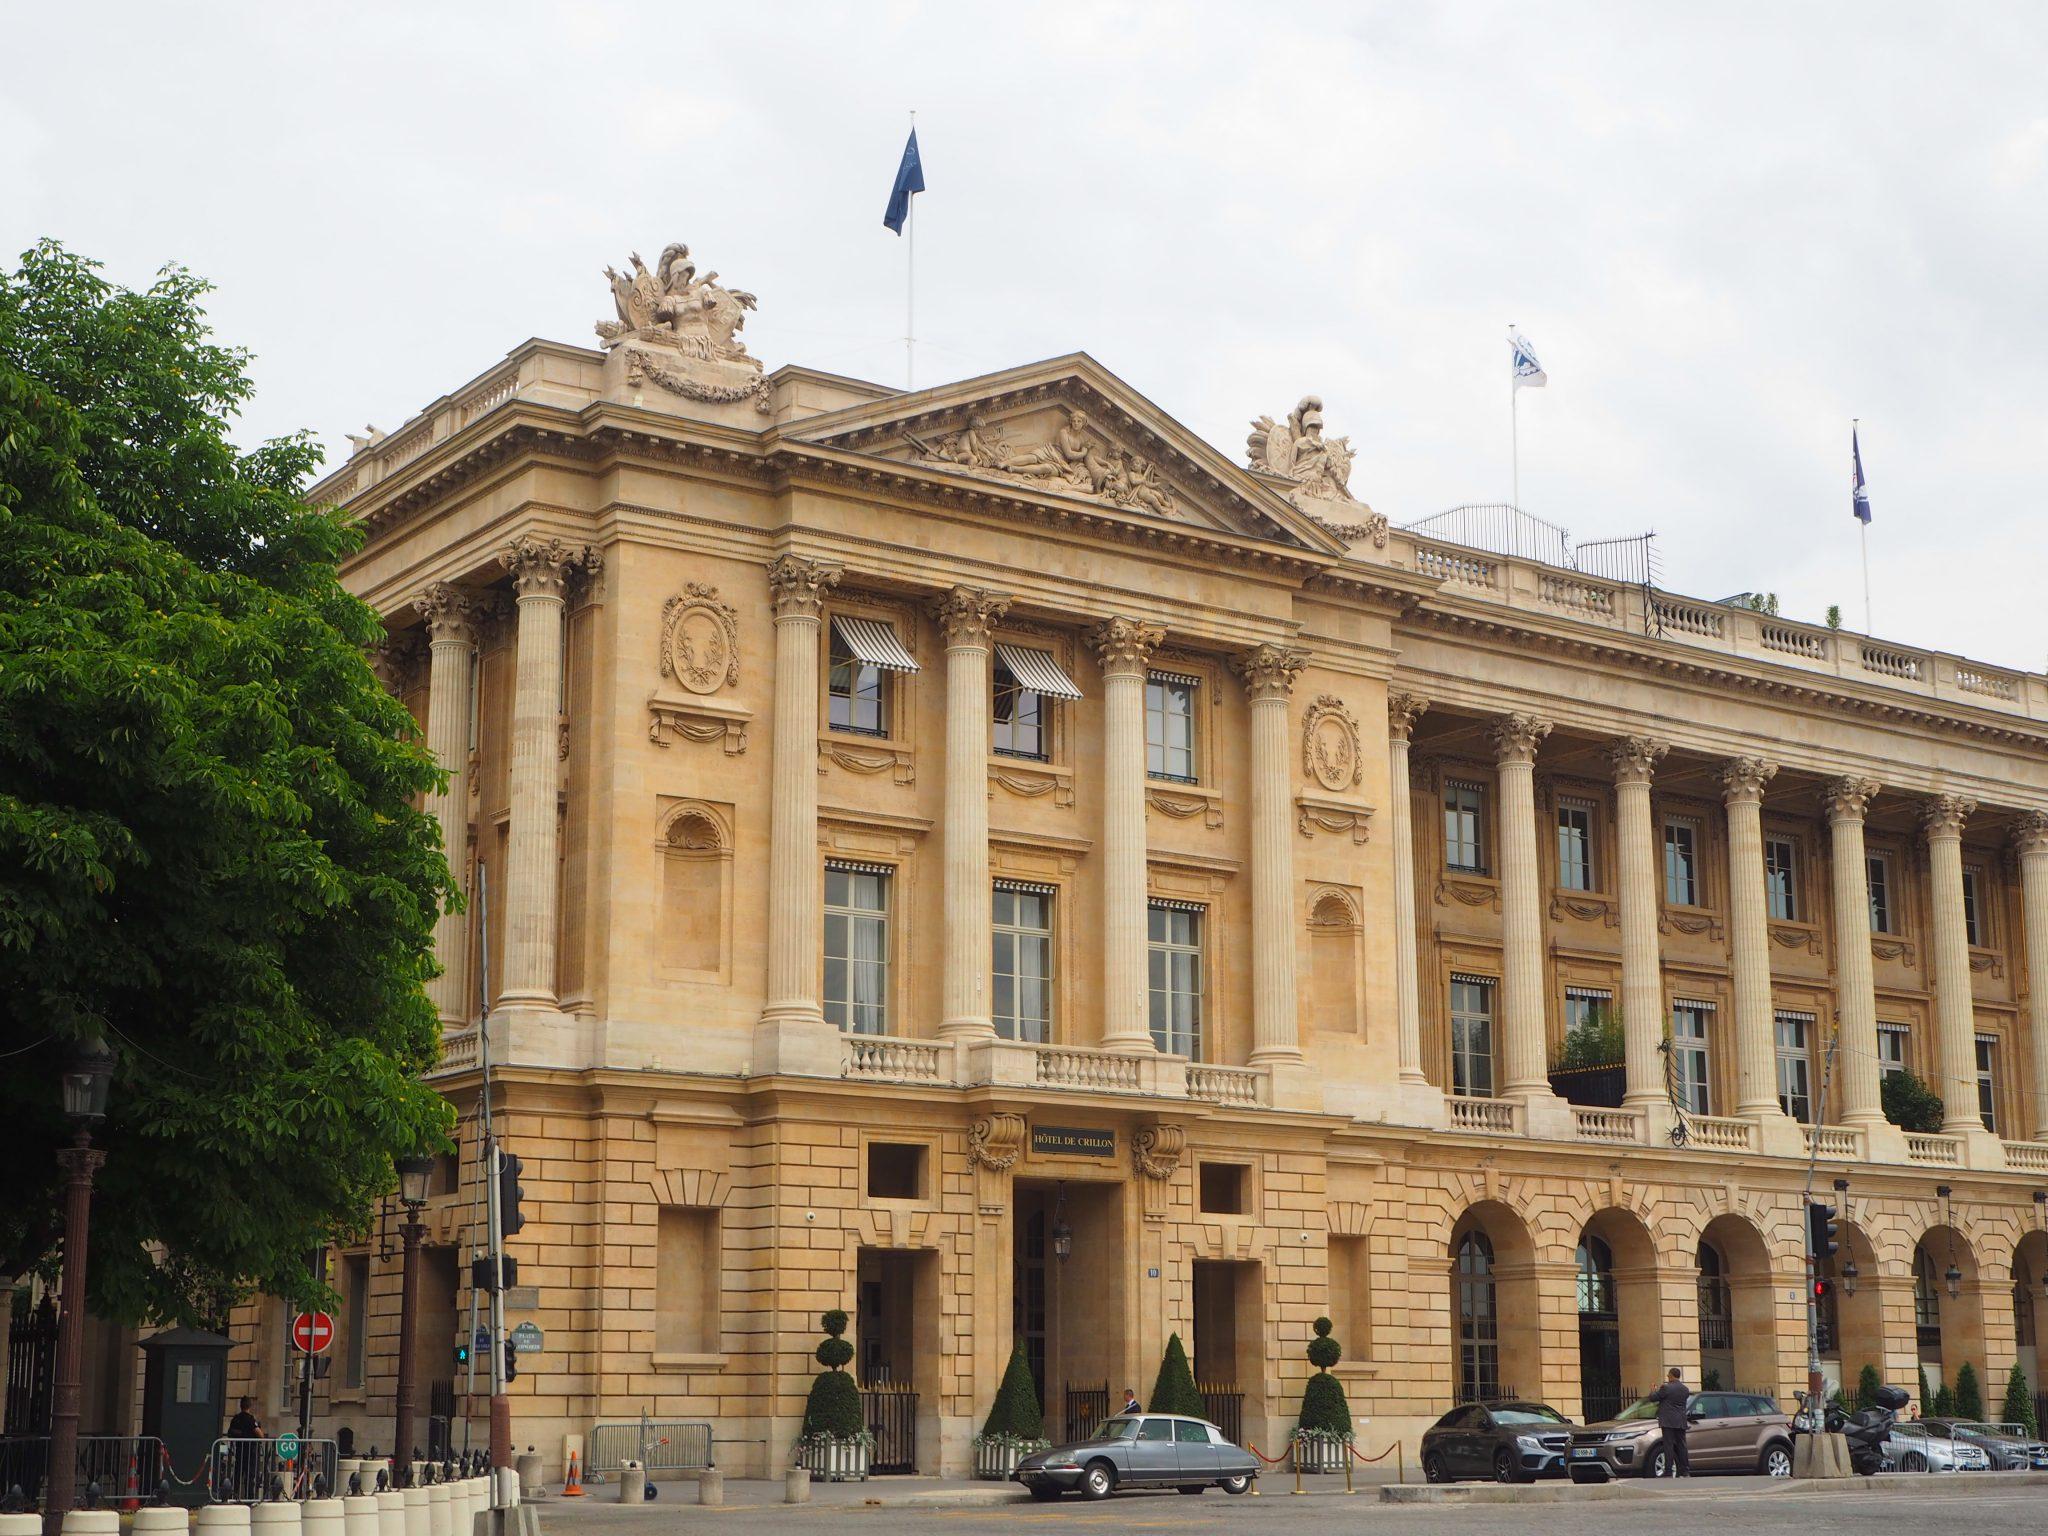 Hôtel de Crillon Paris- Façade